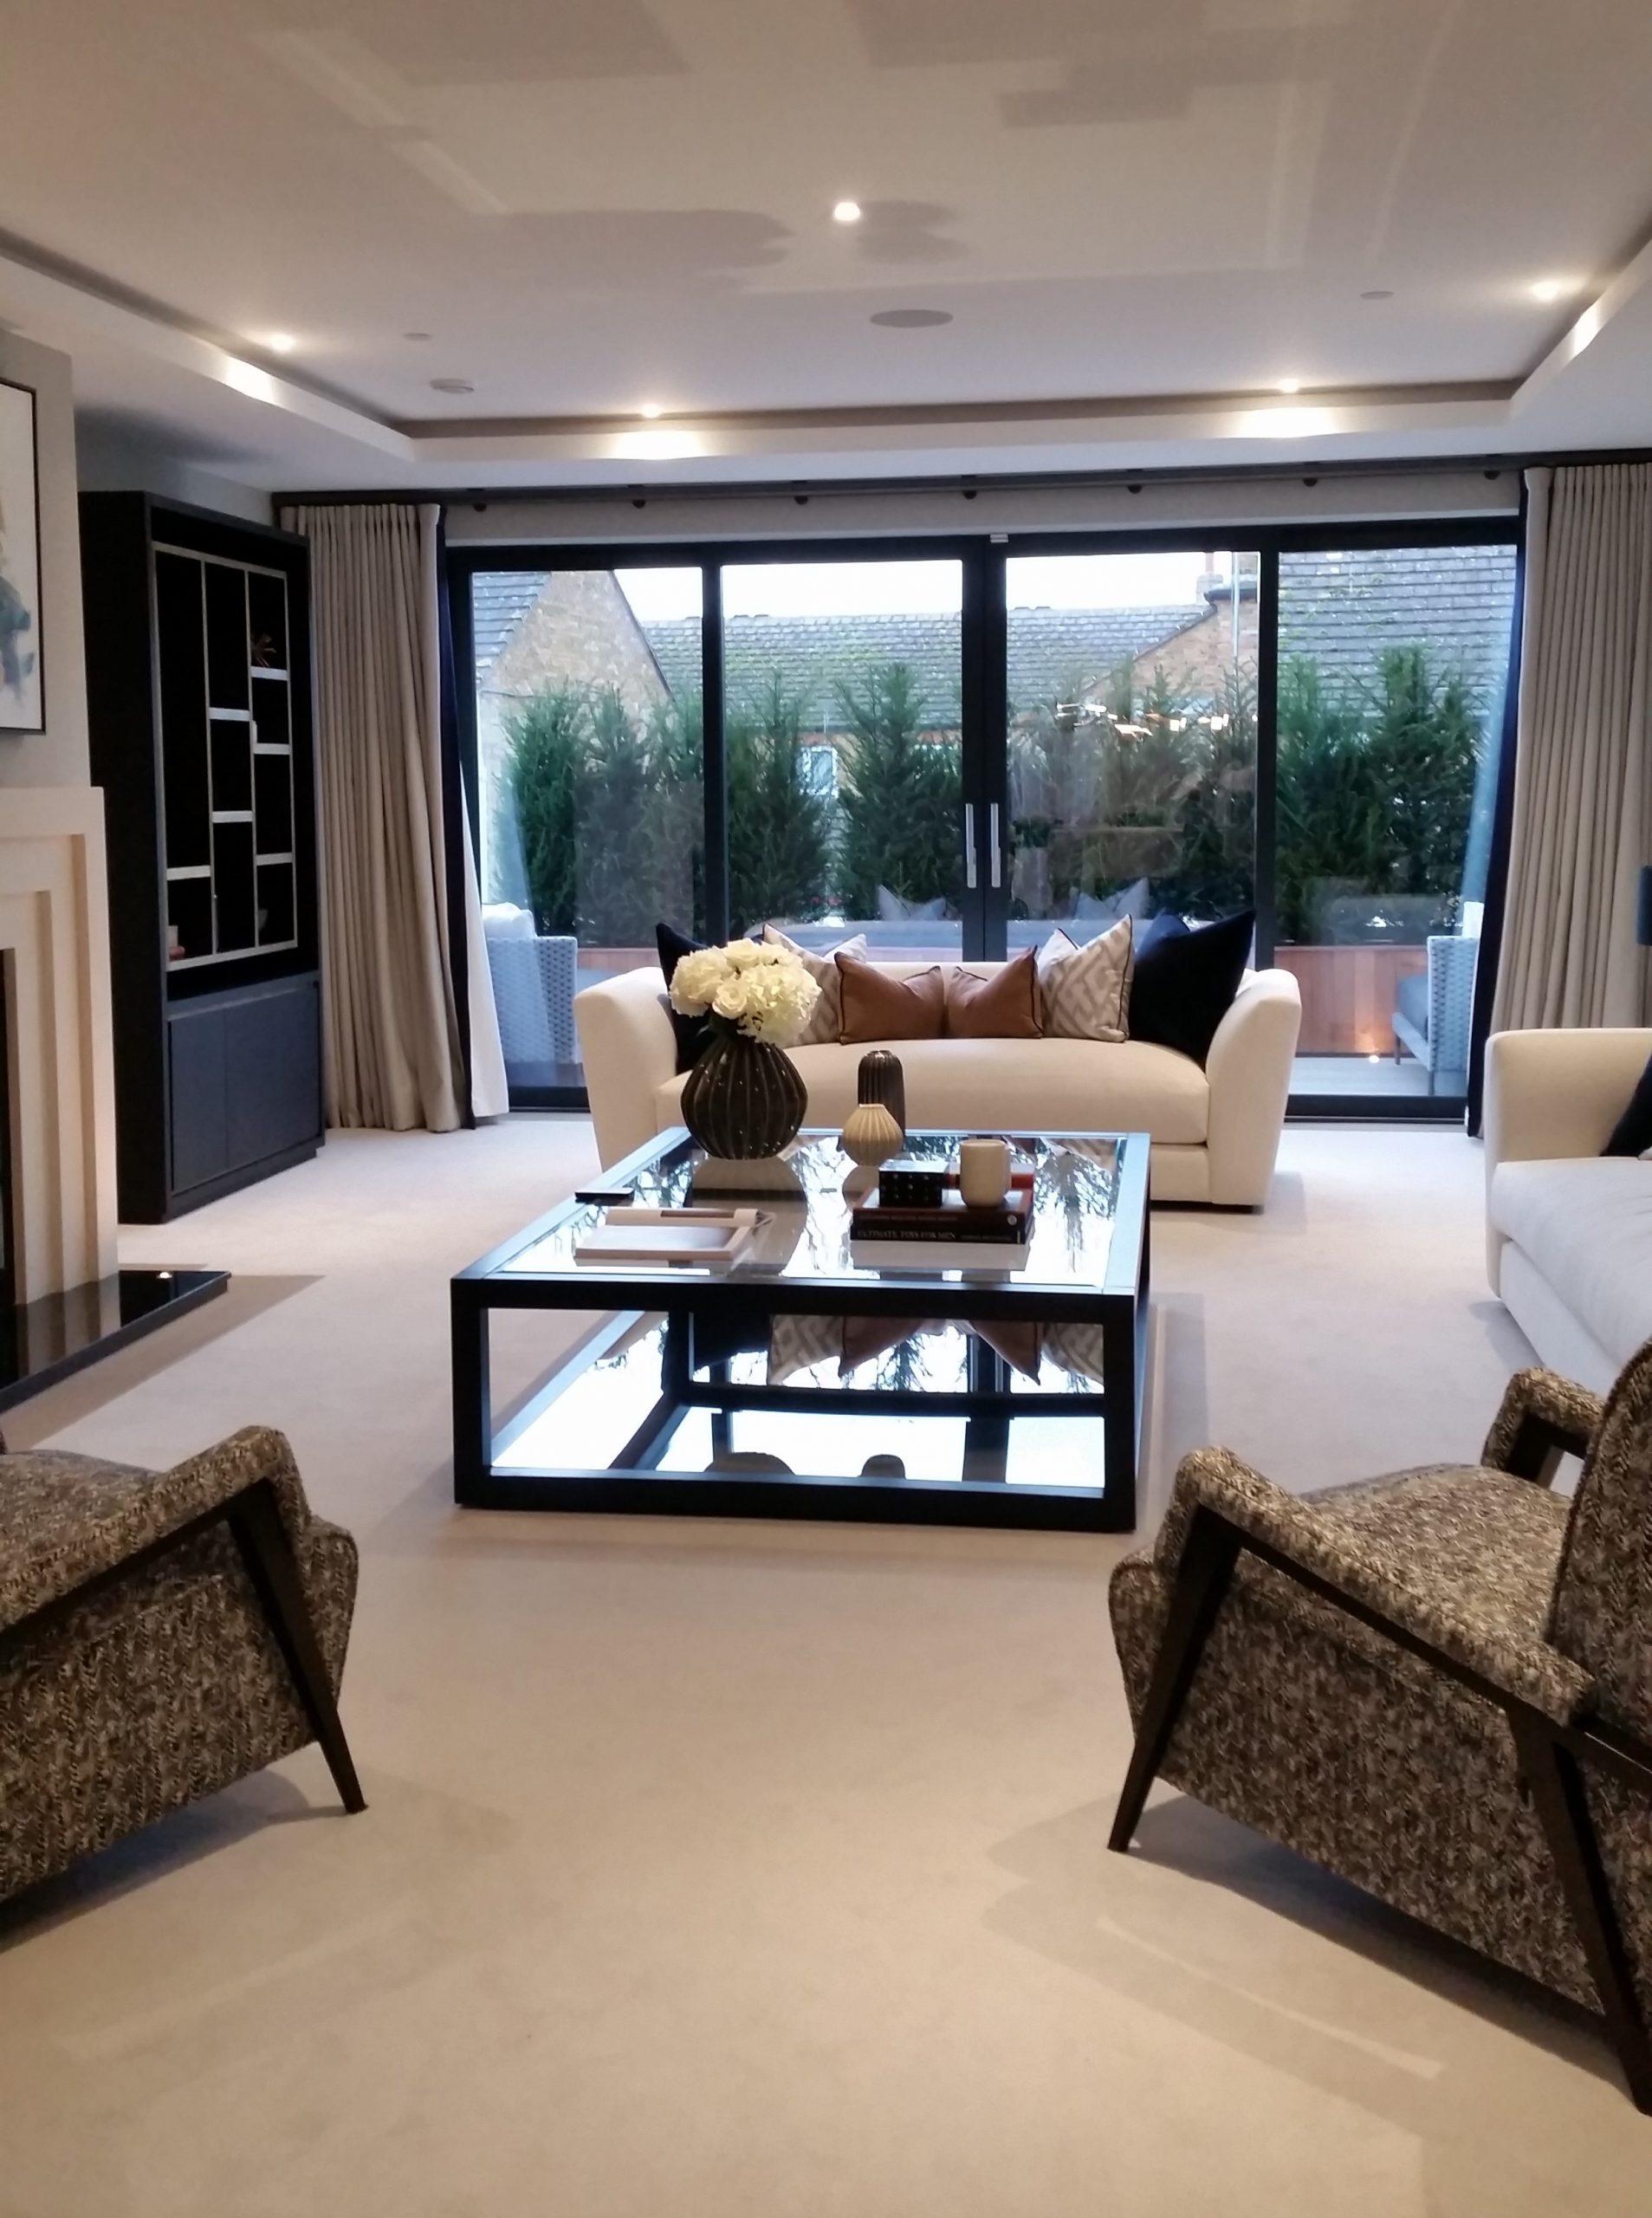 rjv-home-design-refurbishment-london-61141d3795b89